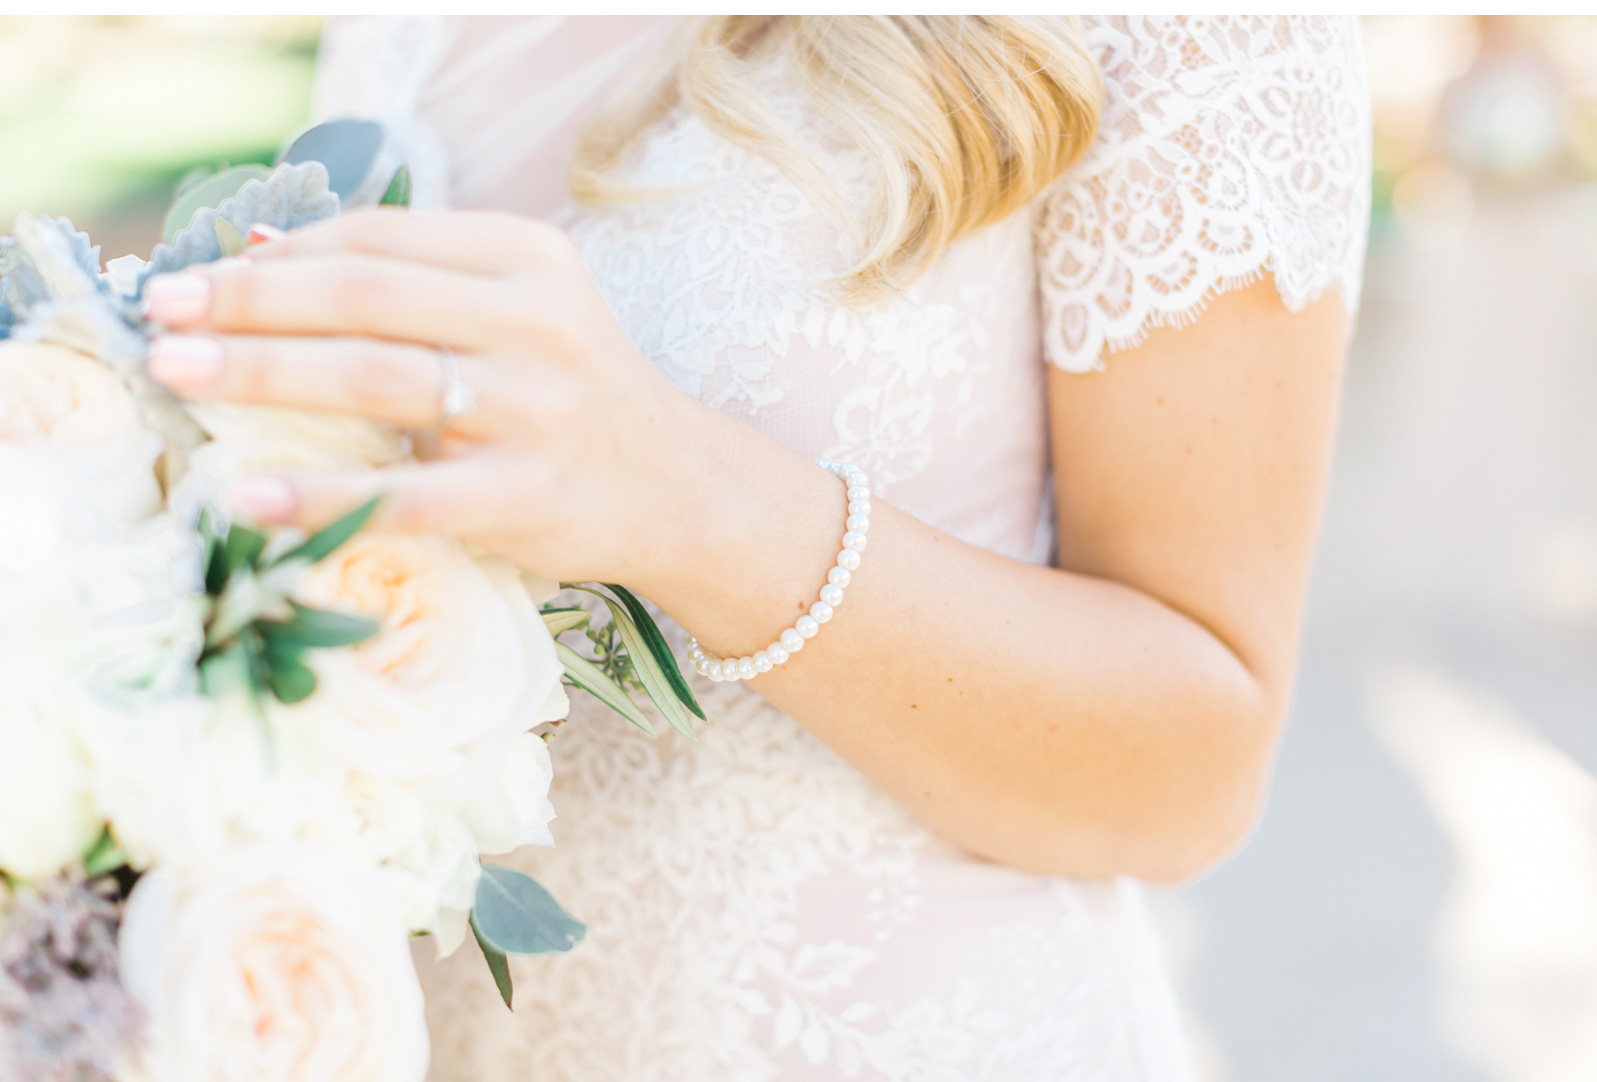 Temecula-Wedding-Photographer-Style-Me-Pretty-Natalie-Schutt-Photography_18.jpg